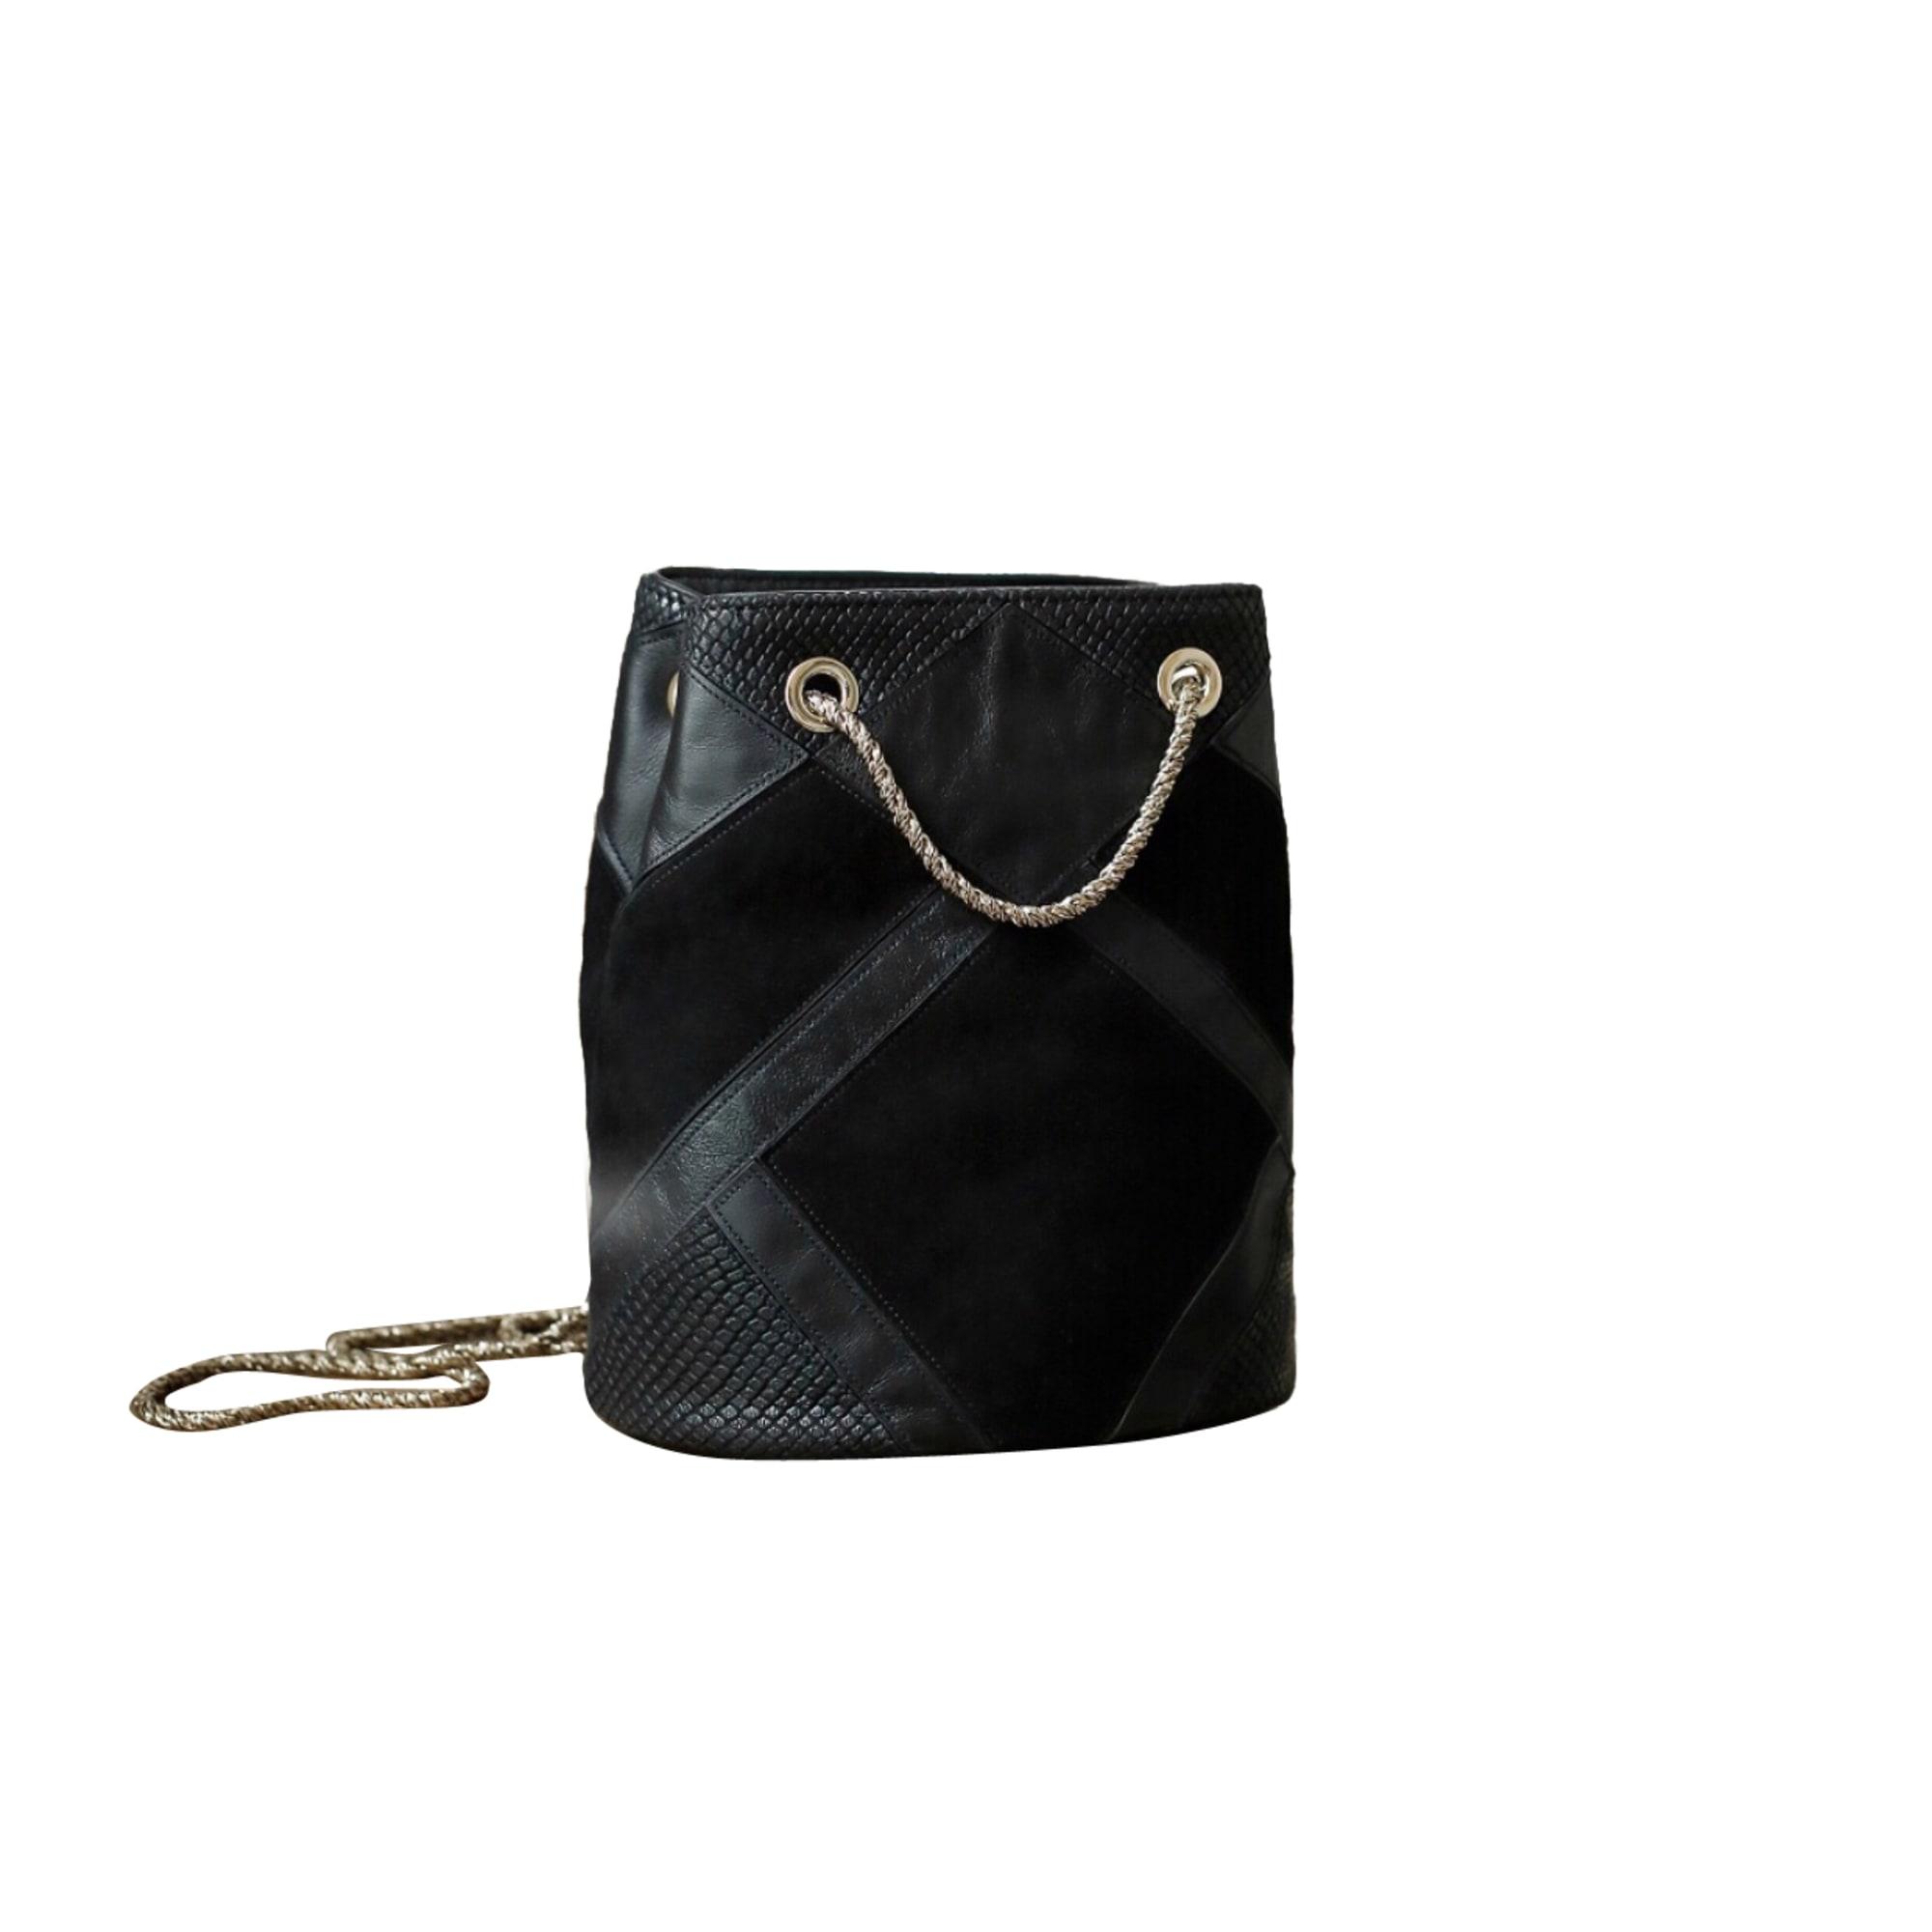 Leather Handbag SÉZANE Black